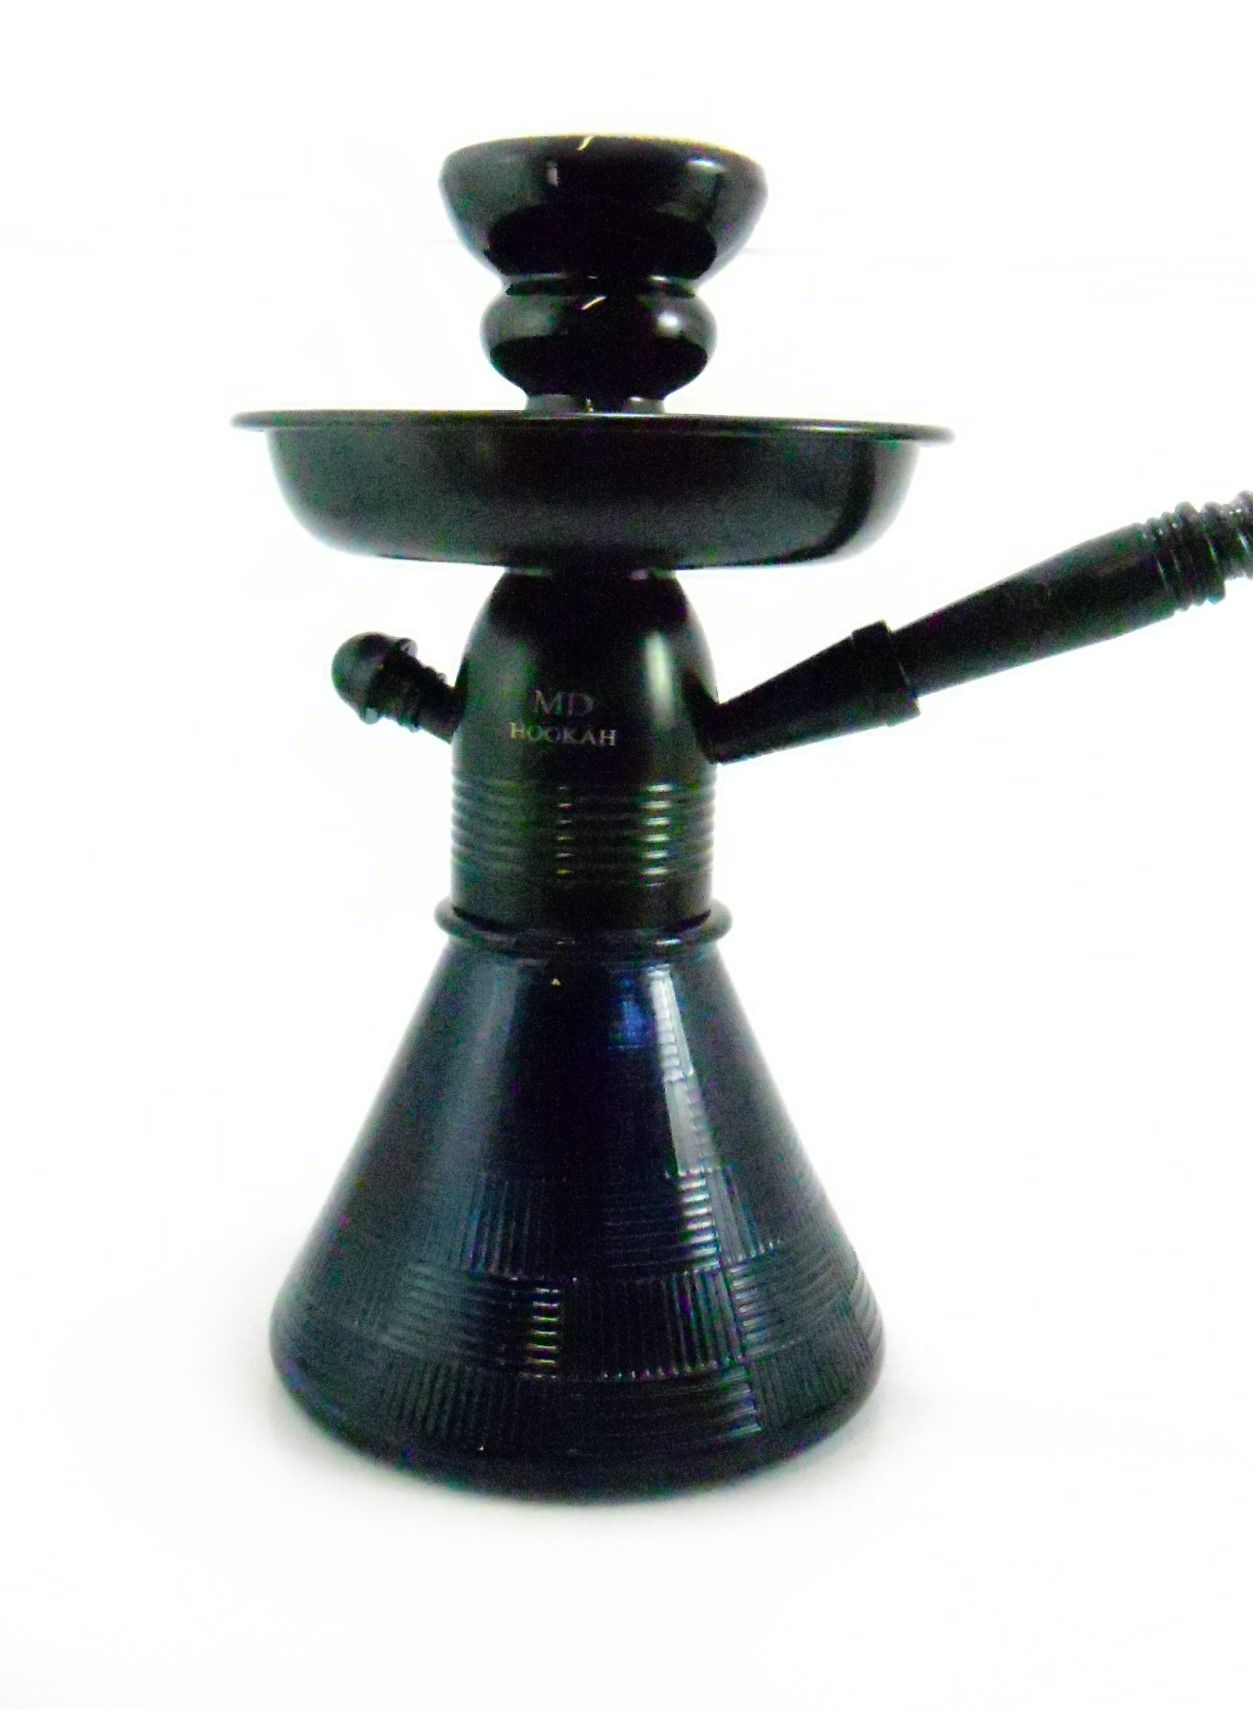 Narguile MD Hookah PETIT 23cm. Corpo em alumínio anodizado, vaso base larga PRETO, mangueira lavável